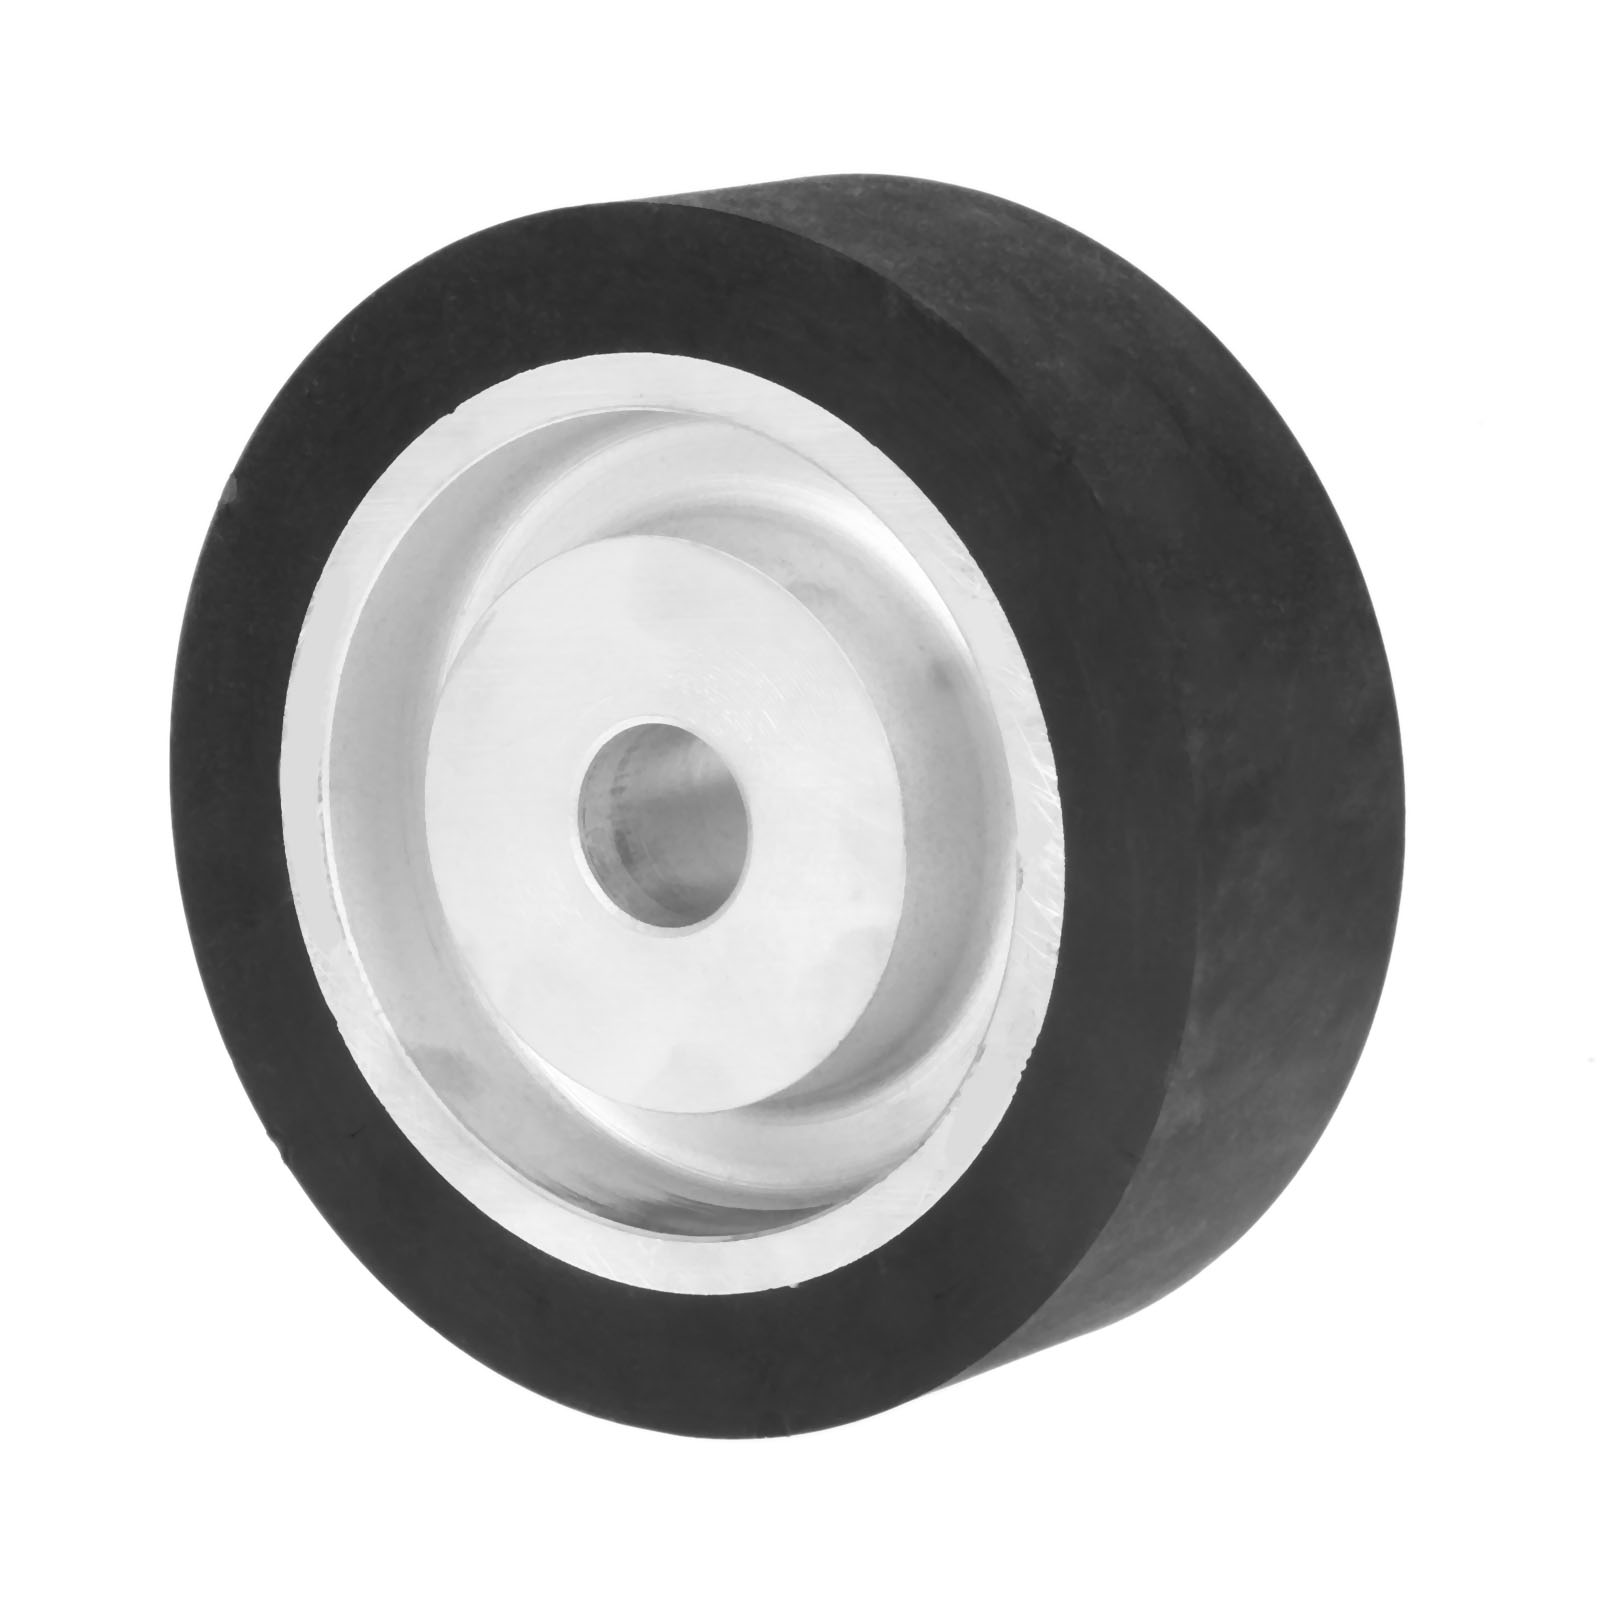 DRELD 150*50*25mm Flat Surface Rubber Contact Wheel Belt Grinder Wheel Abrasive Belt Set Polishing Grinding Sanding Wheel